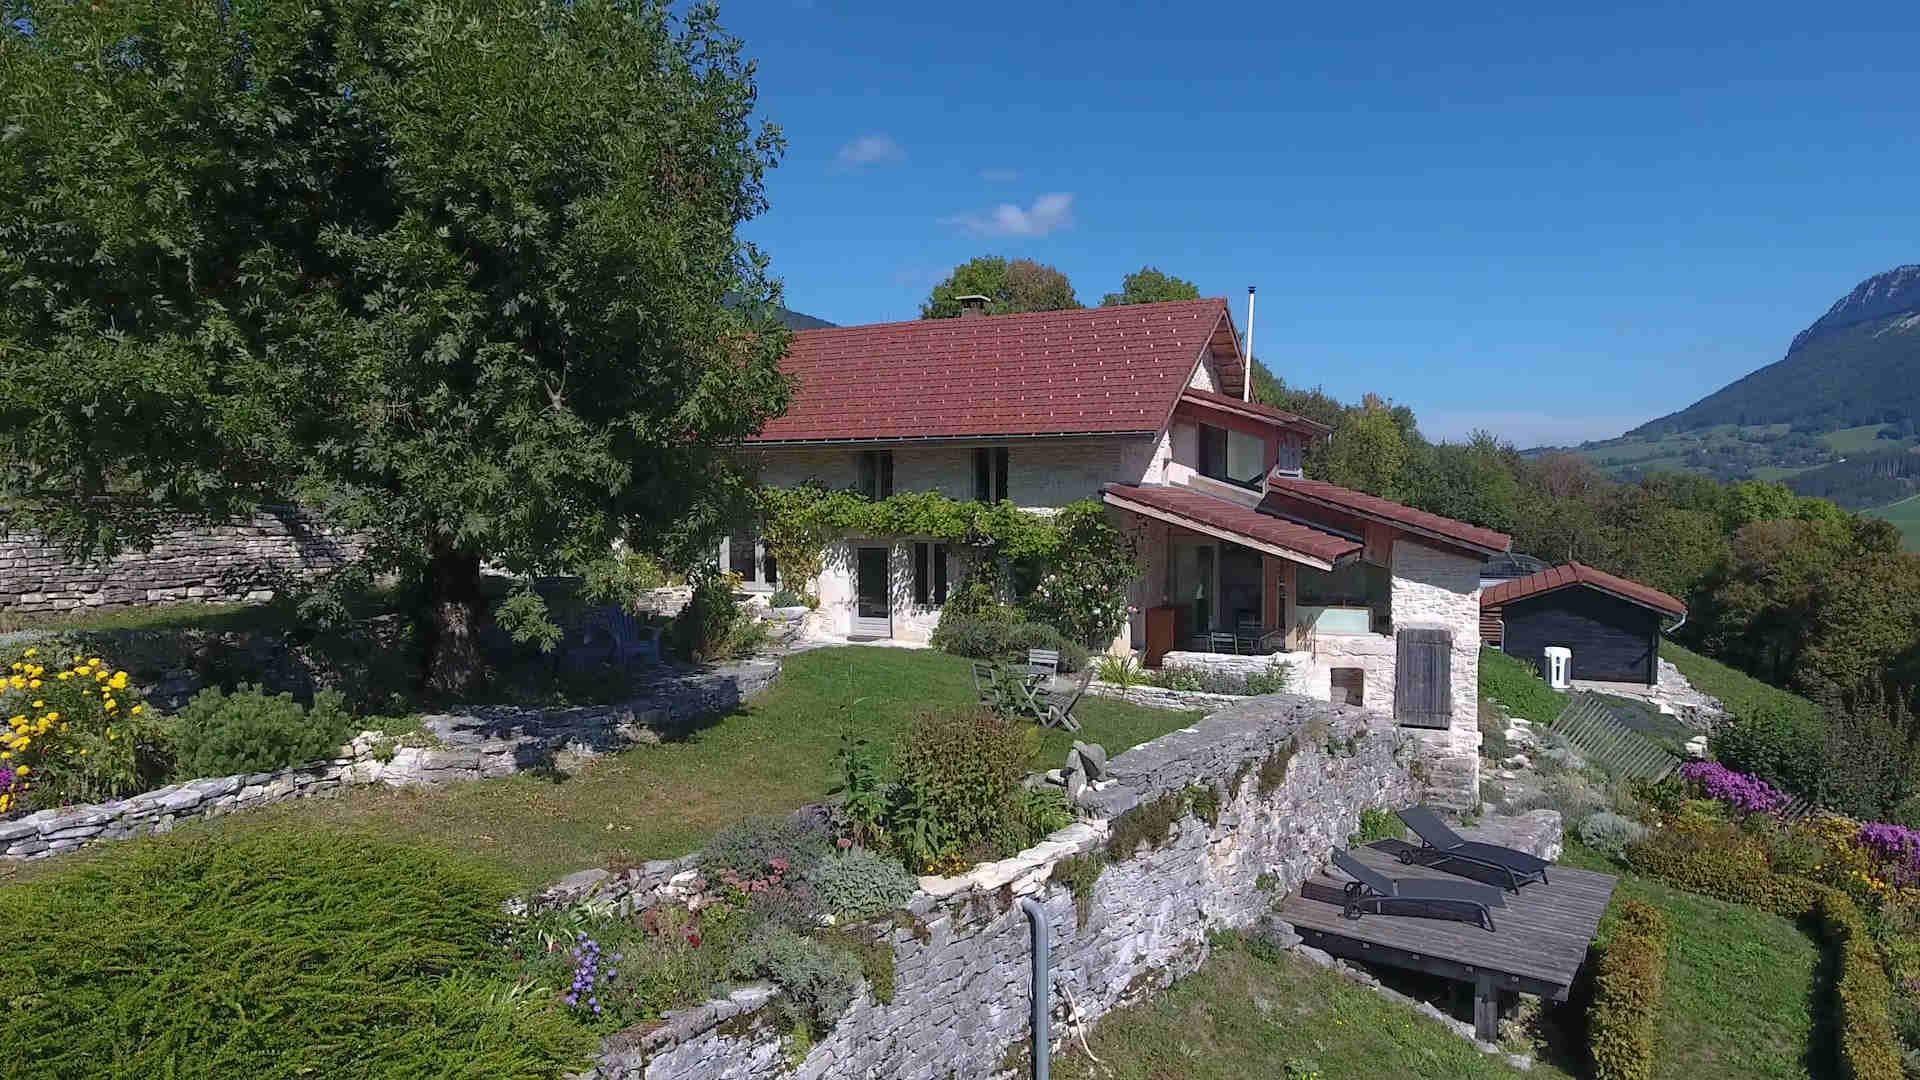 La ferme des Glénats : 8 sleeps rental contact, price, availability